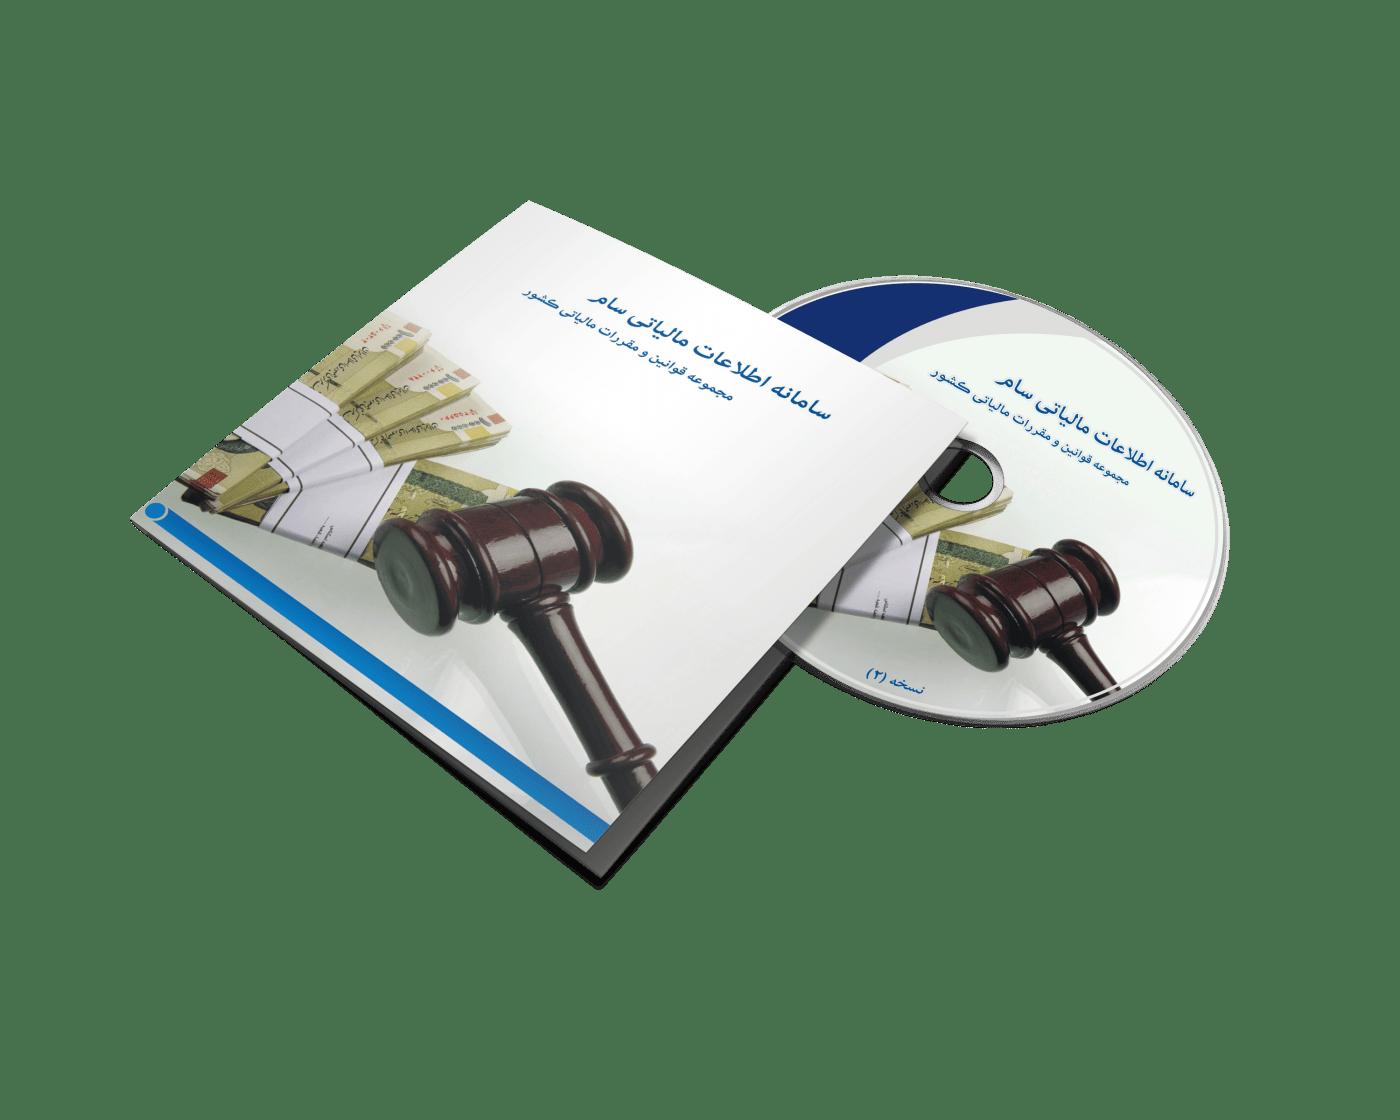 چاپ روی سی دی ایرانی